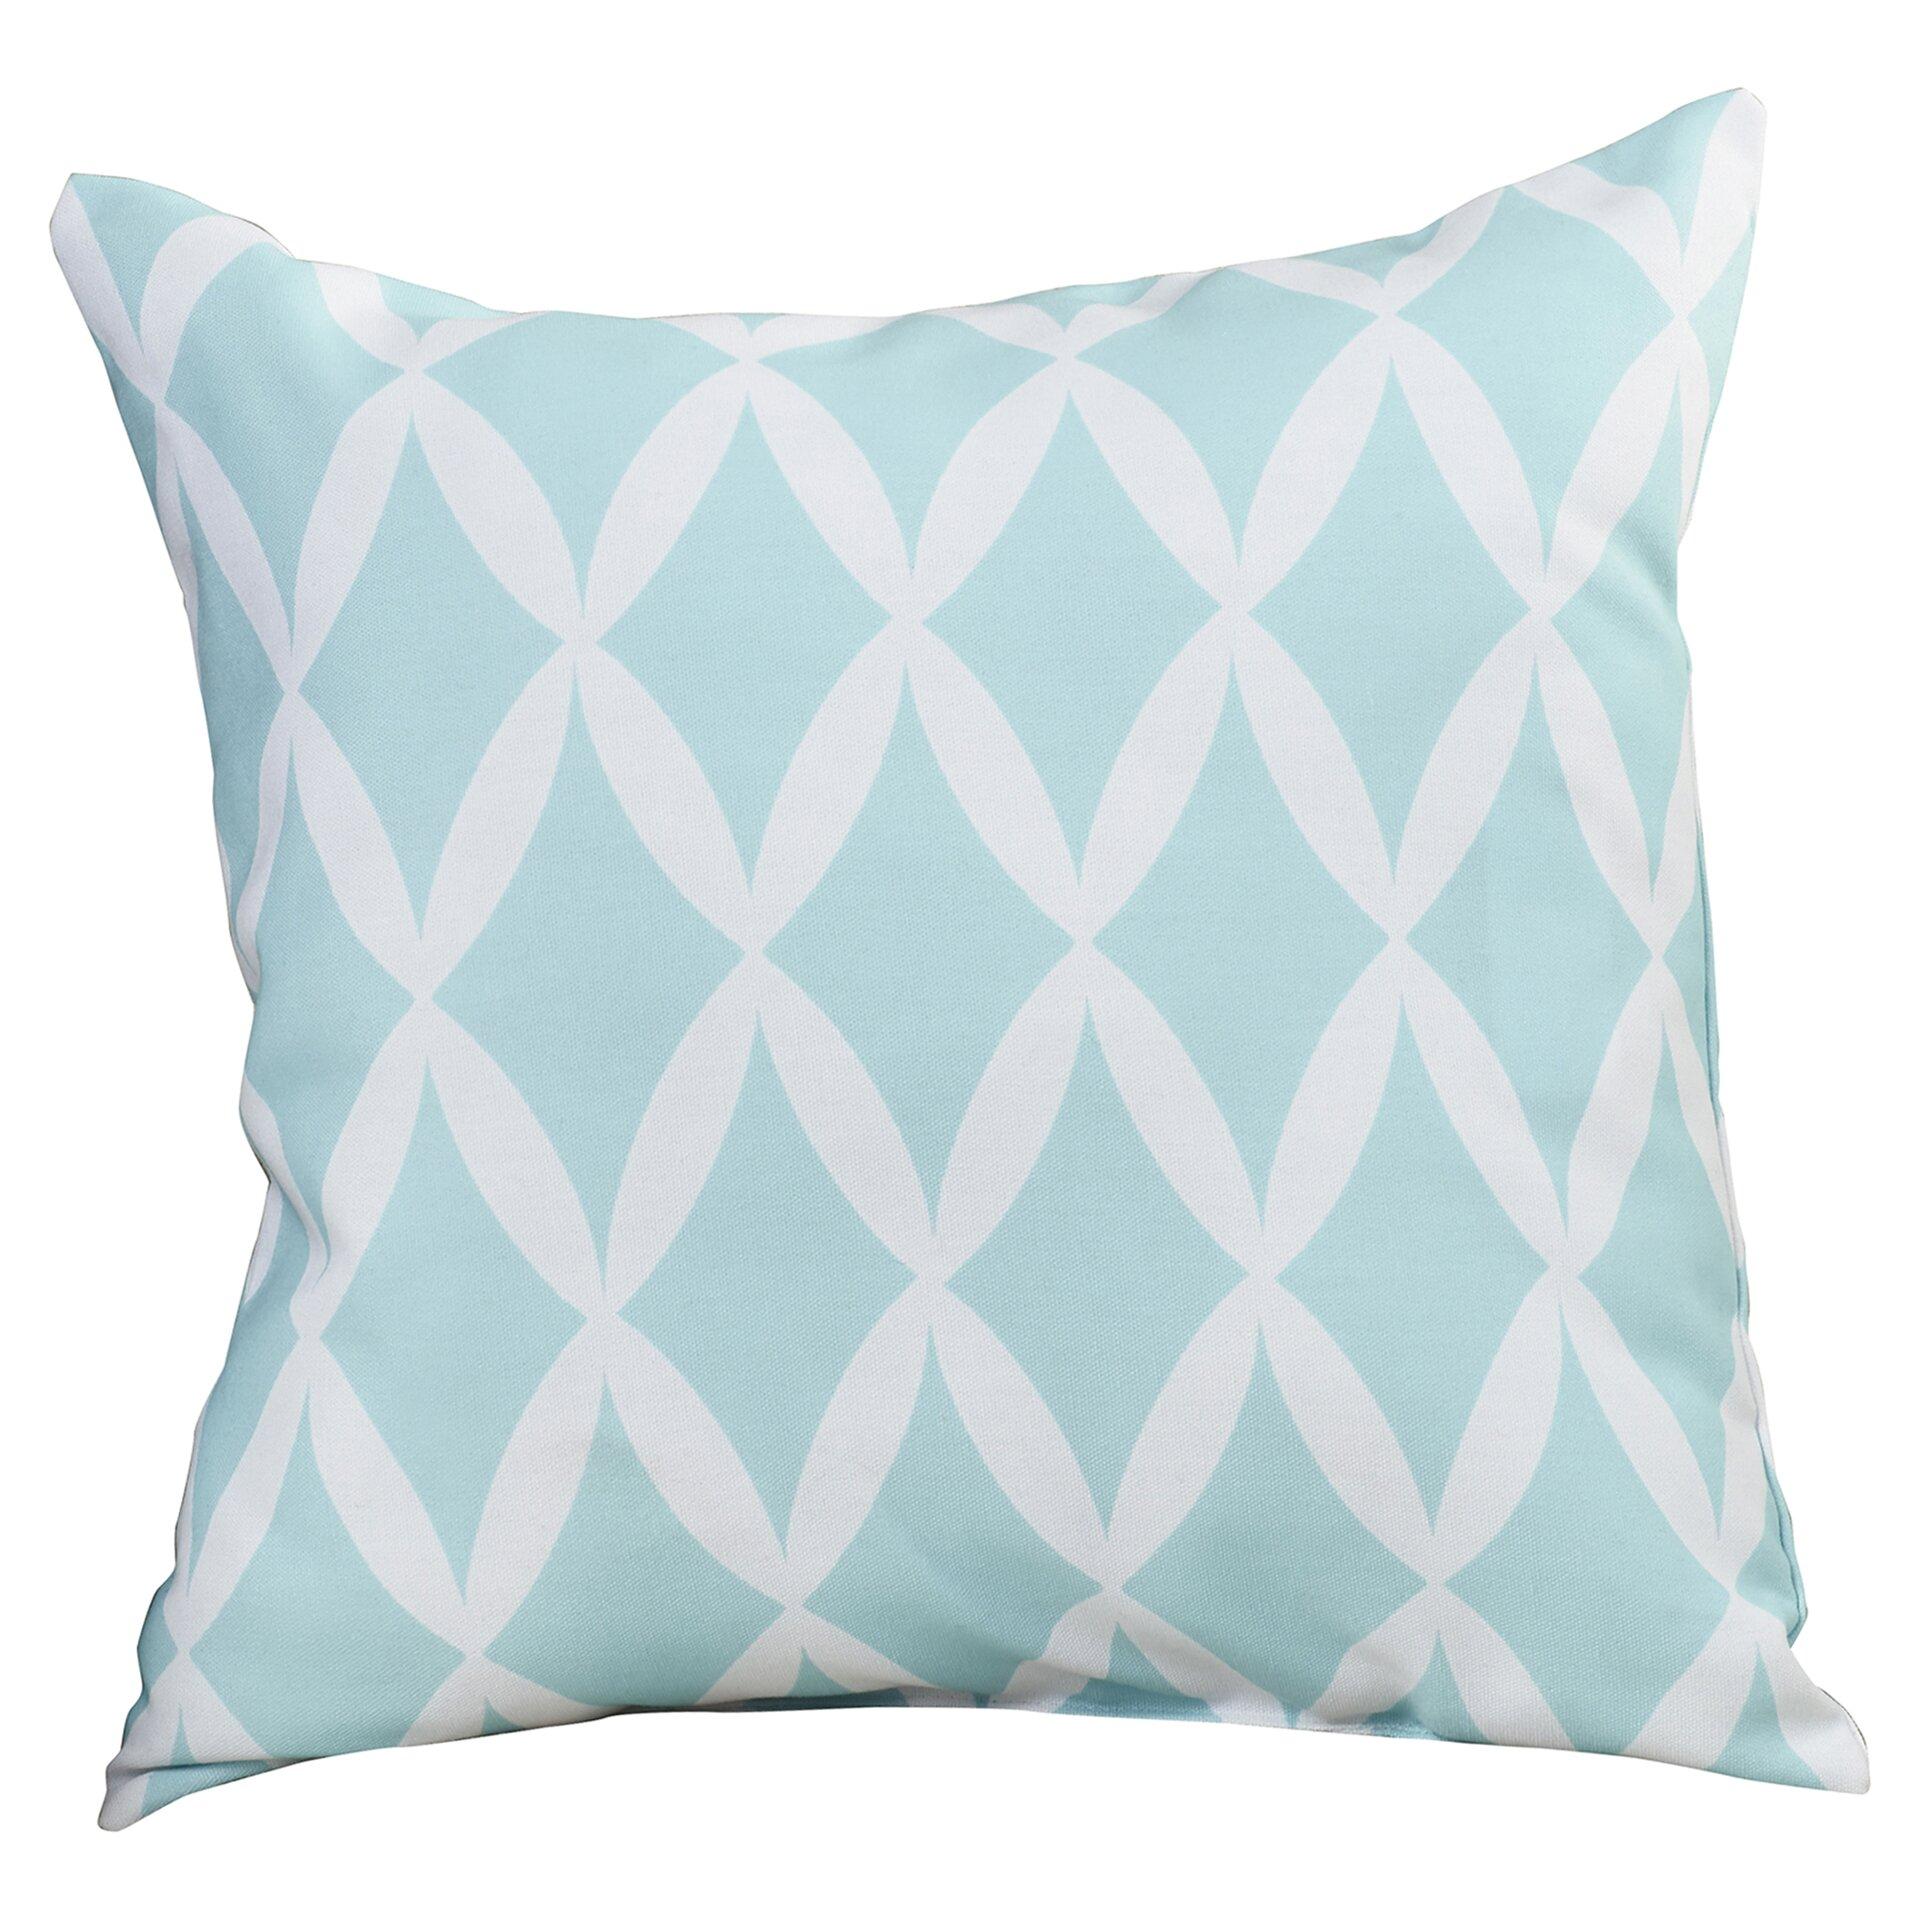 Throw Pillow Down : Brayden Studio Herman Geometric Down Throw Pillow & Reviews Wayfair